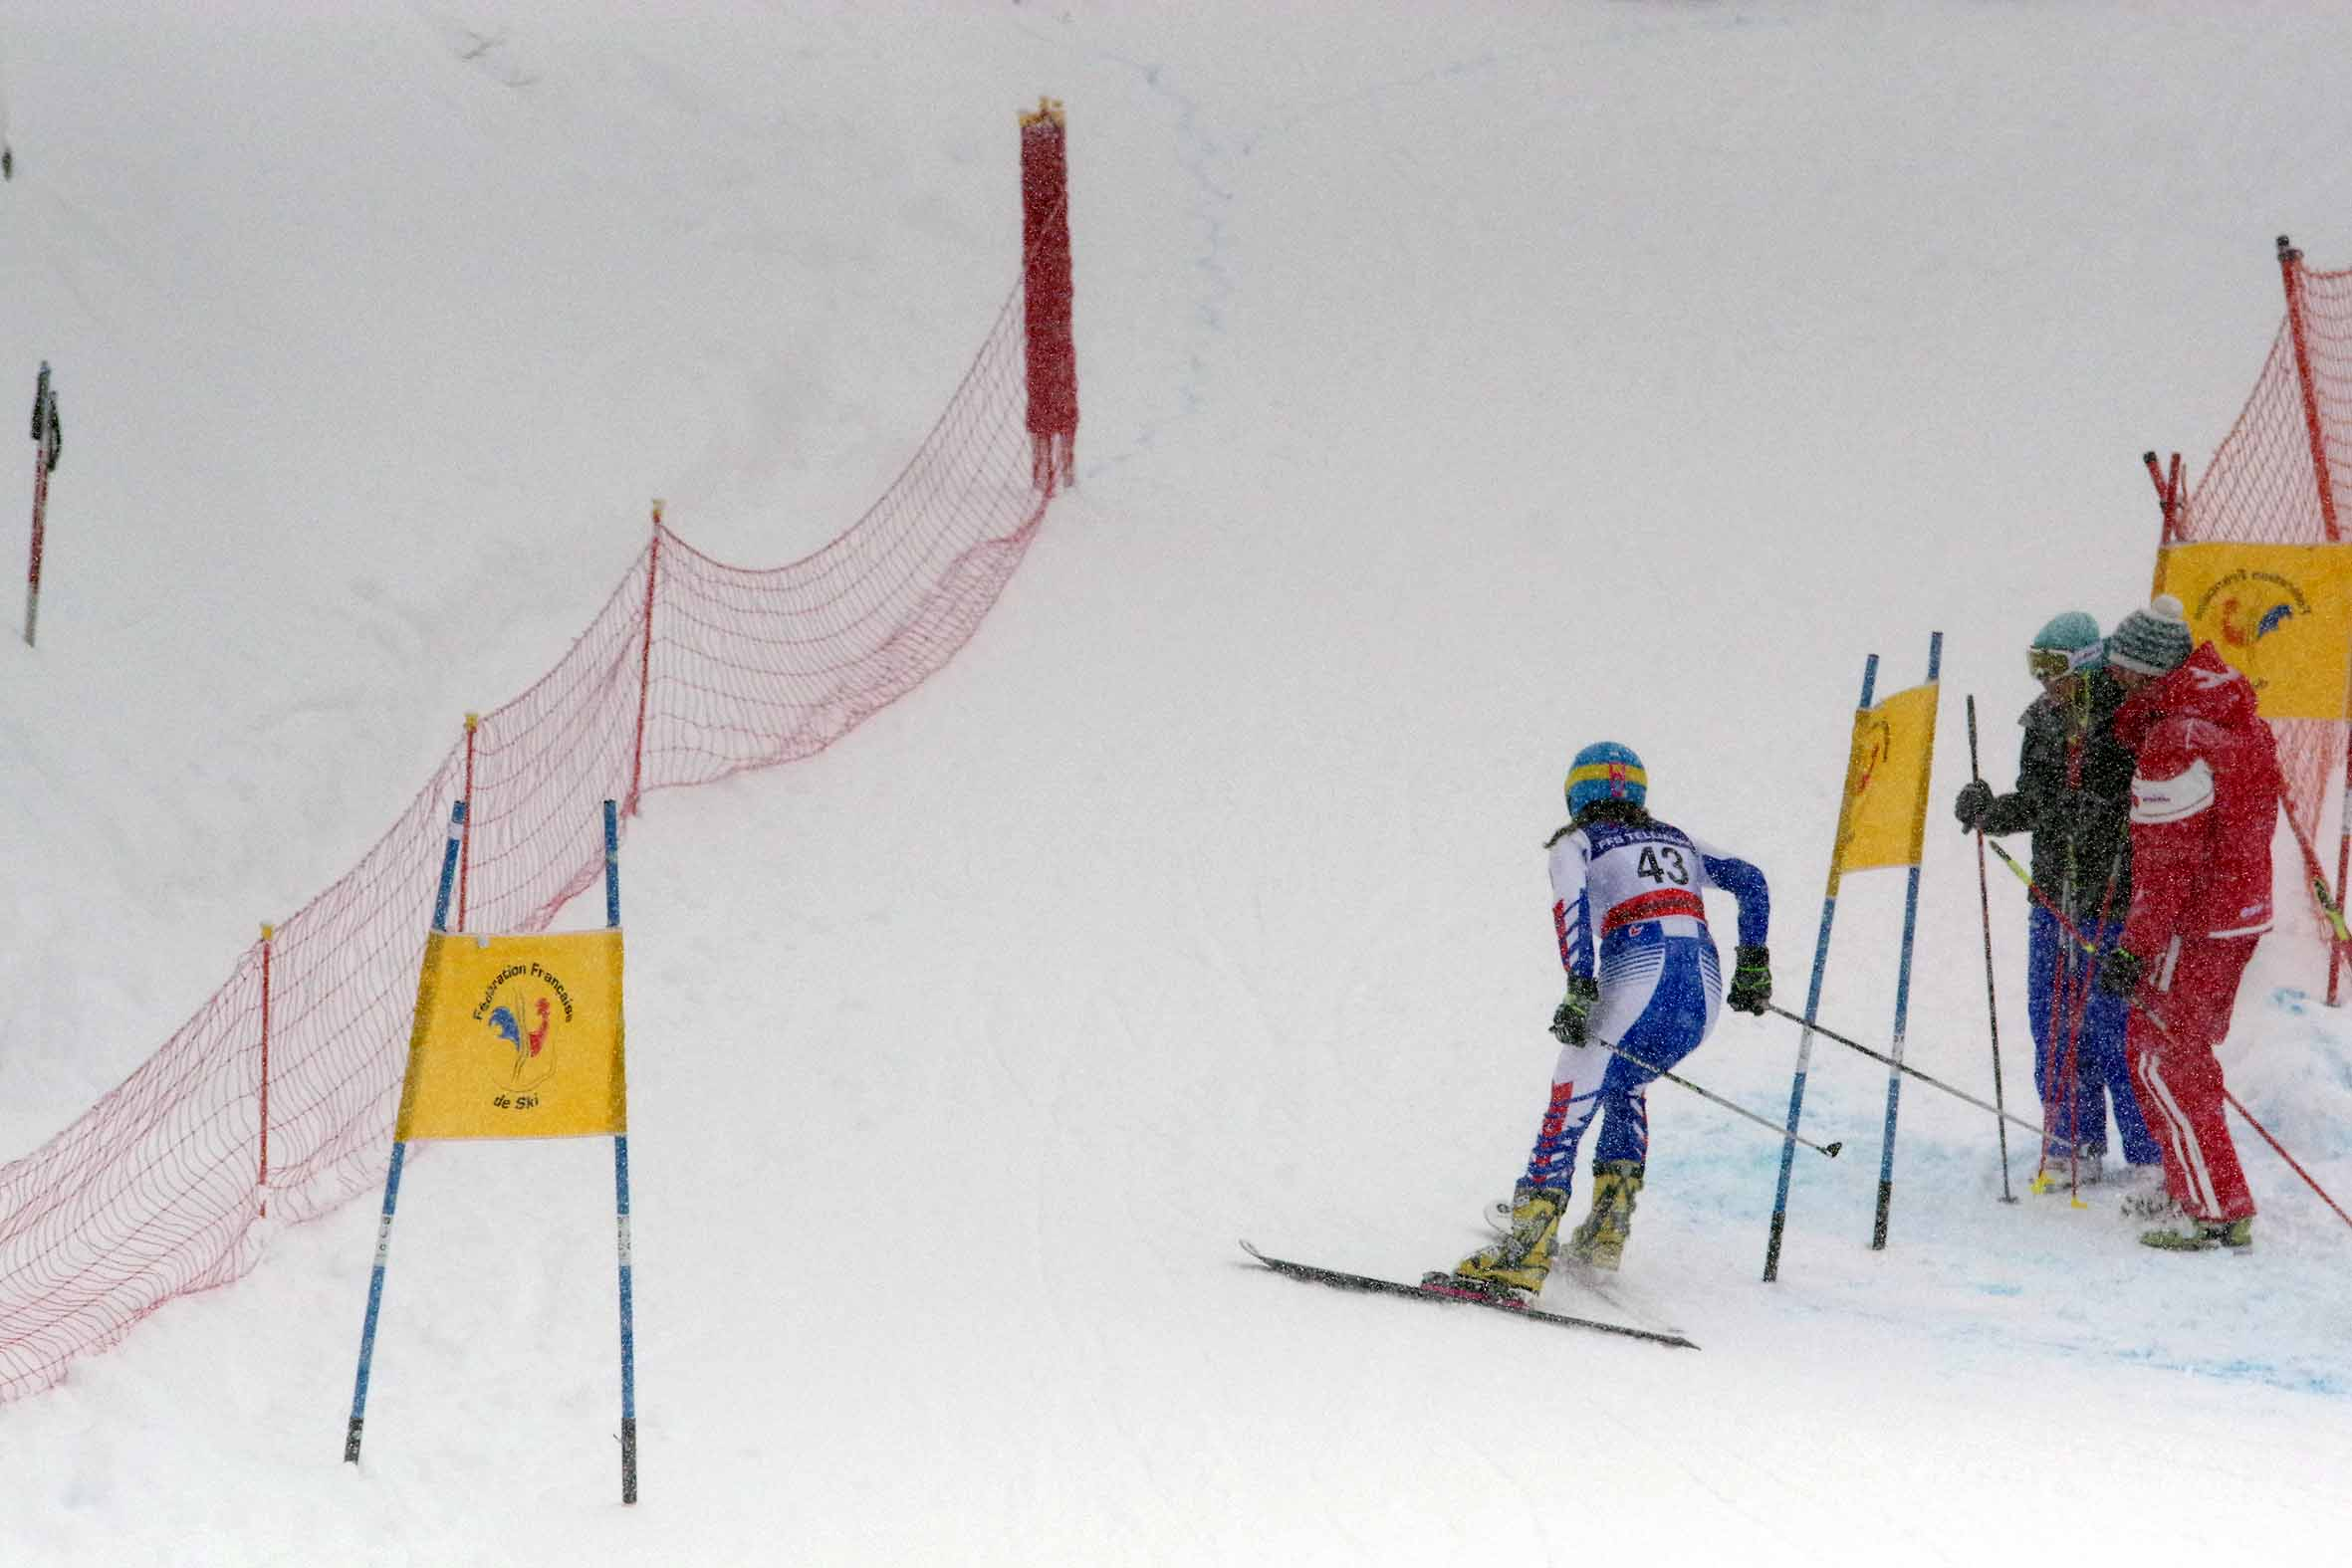 Championnats de France Classic 2015